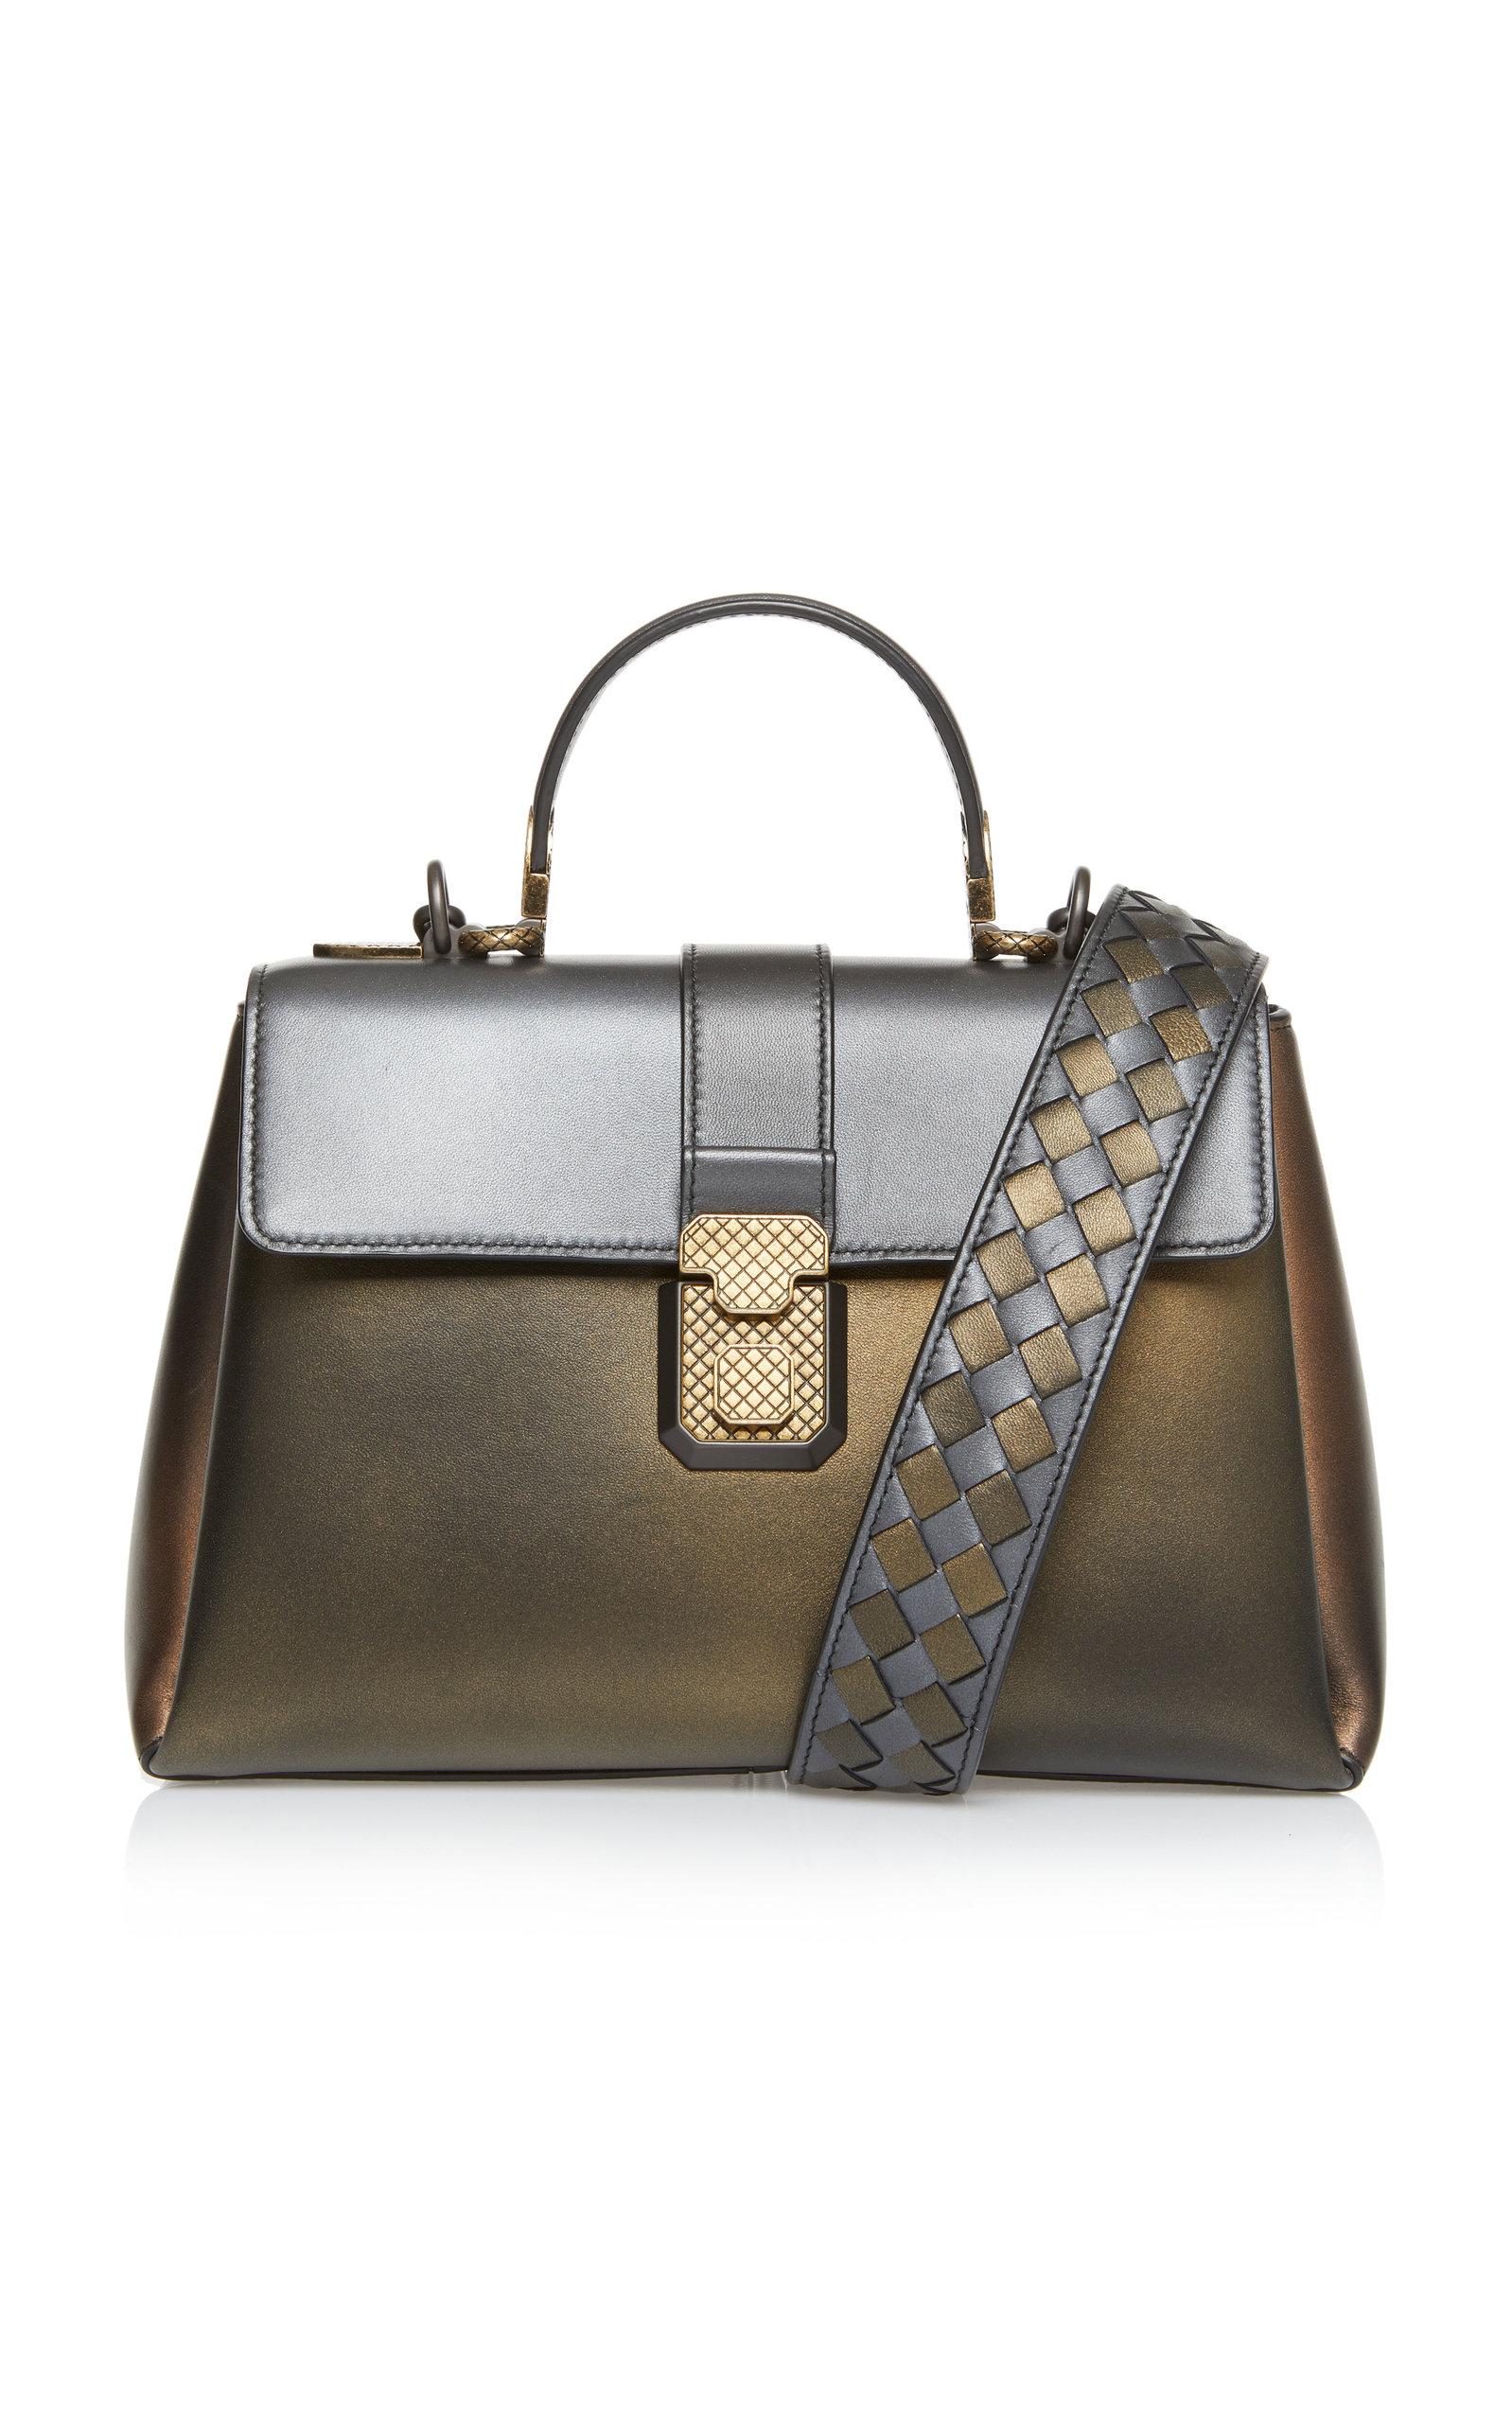 ac64901d18 Antique Piazza Leather Top Handle Bag by Bottega Veneta